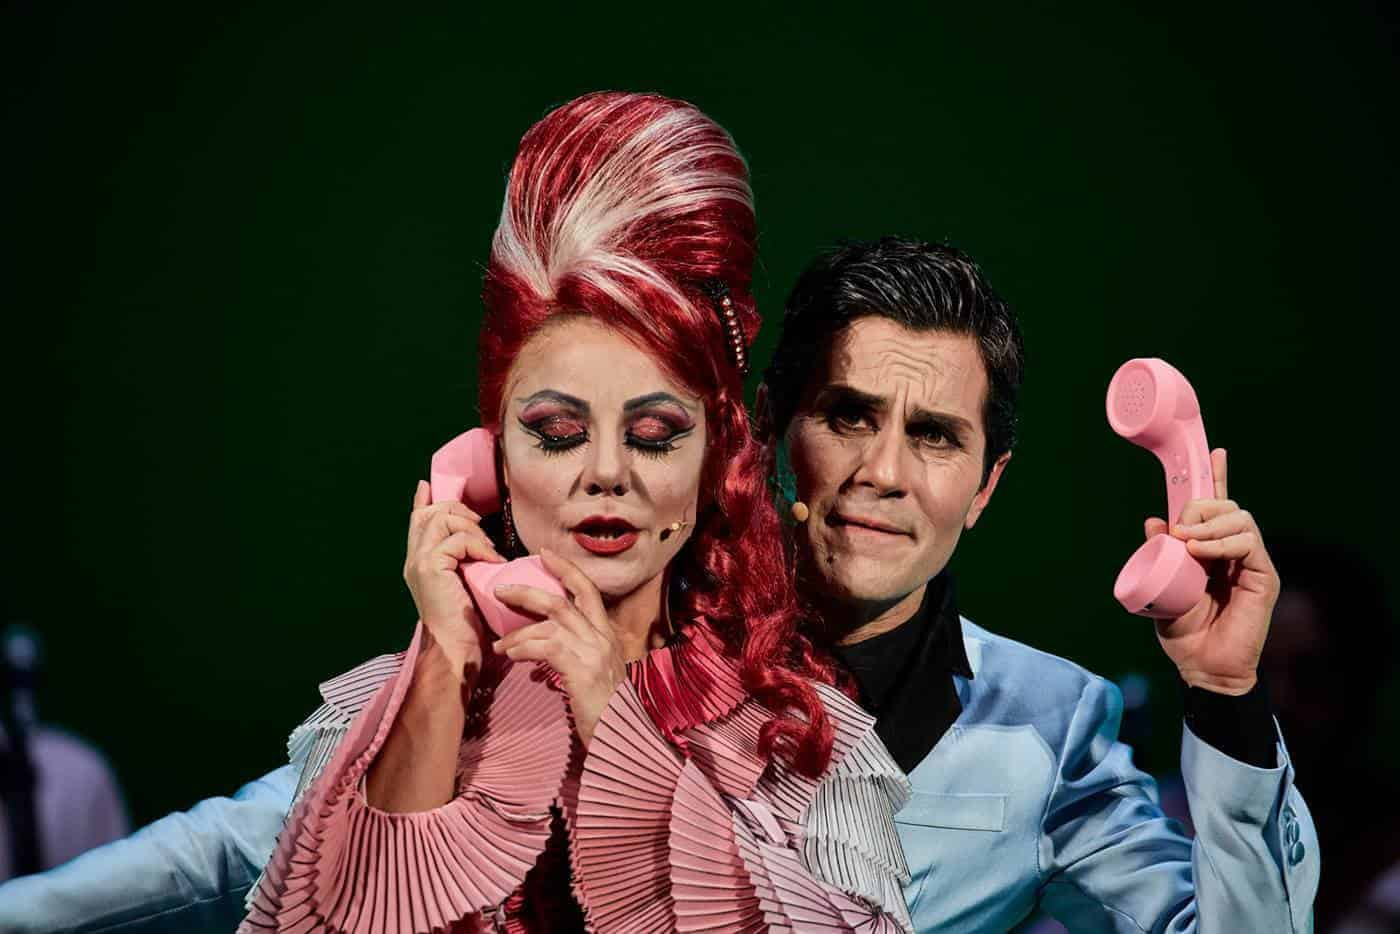 Gaia Aprea e Gianluca Musiu in Madame Pink regia Alfredo Arias foto Giovanni Ambrosio (2)